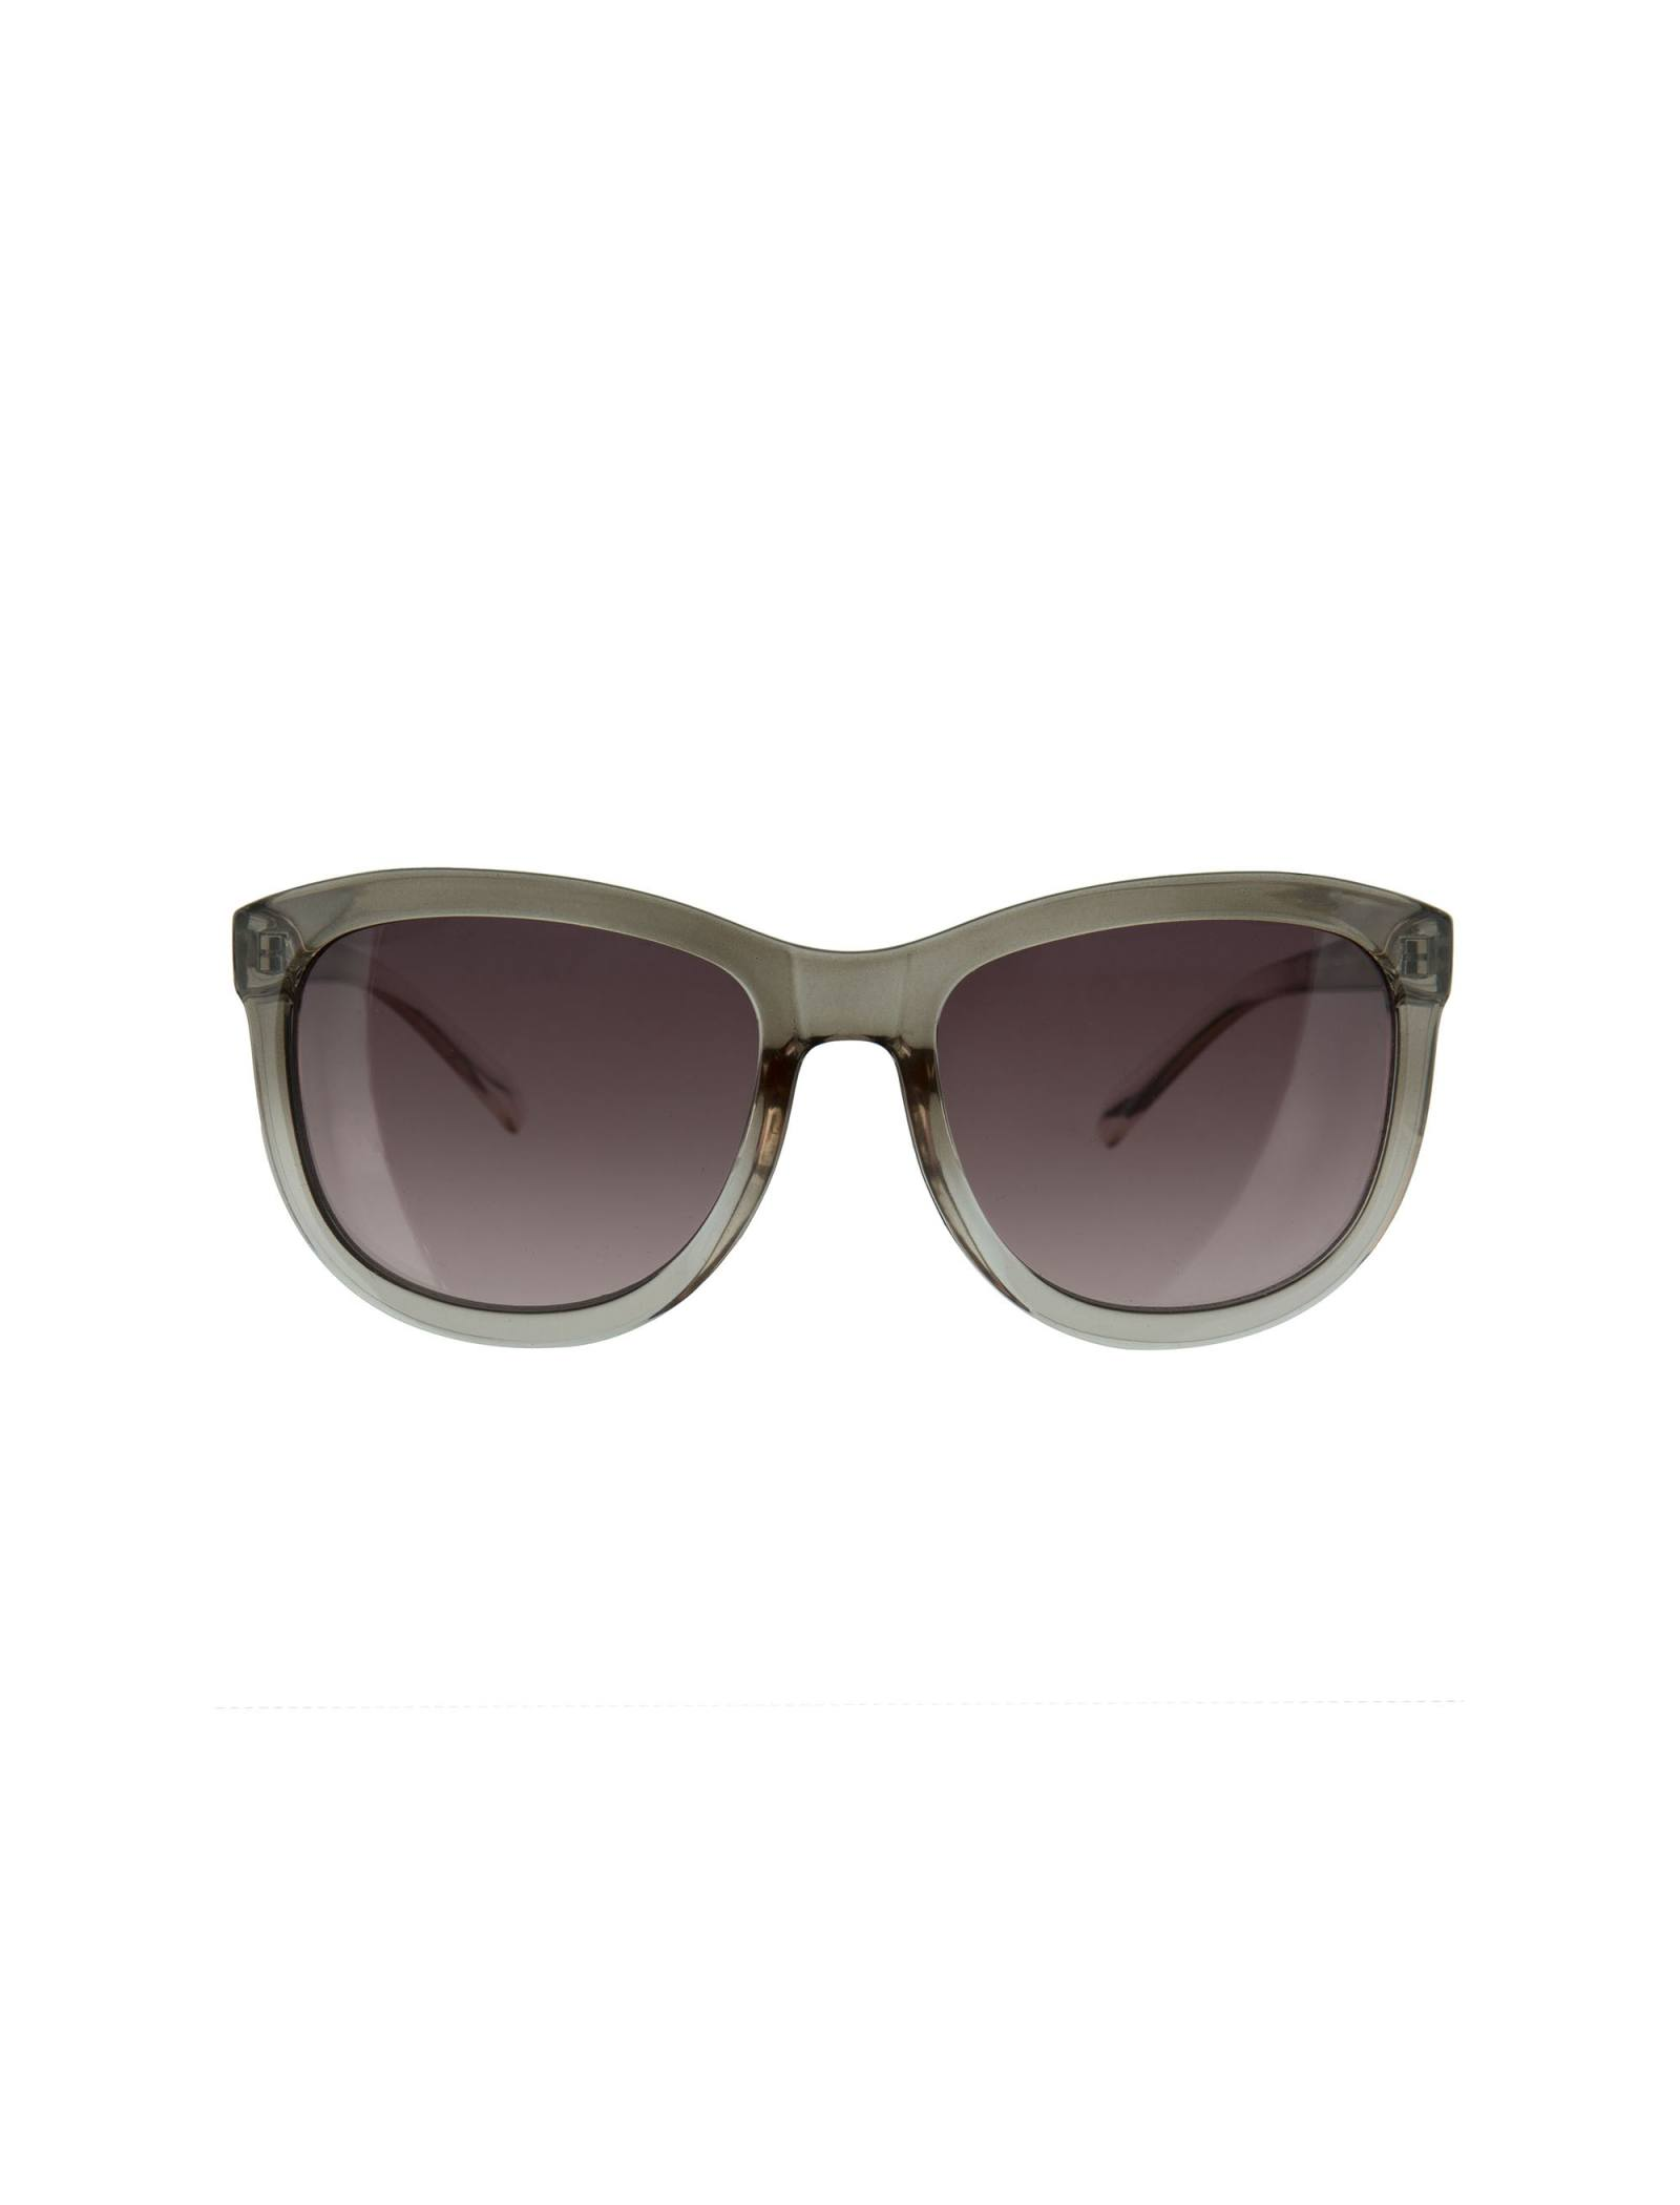 عینک آفتابی ویفرر زنانه - پی سز - قهوه اي  - 1